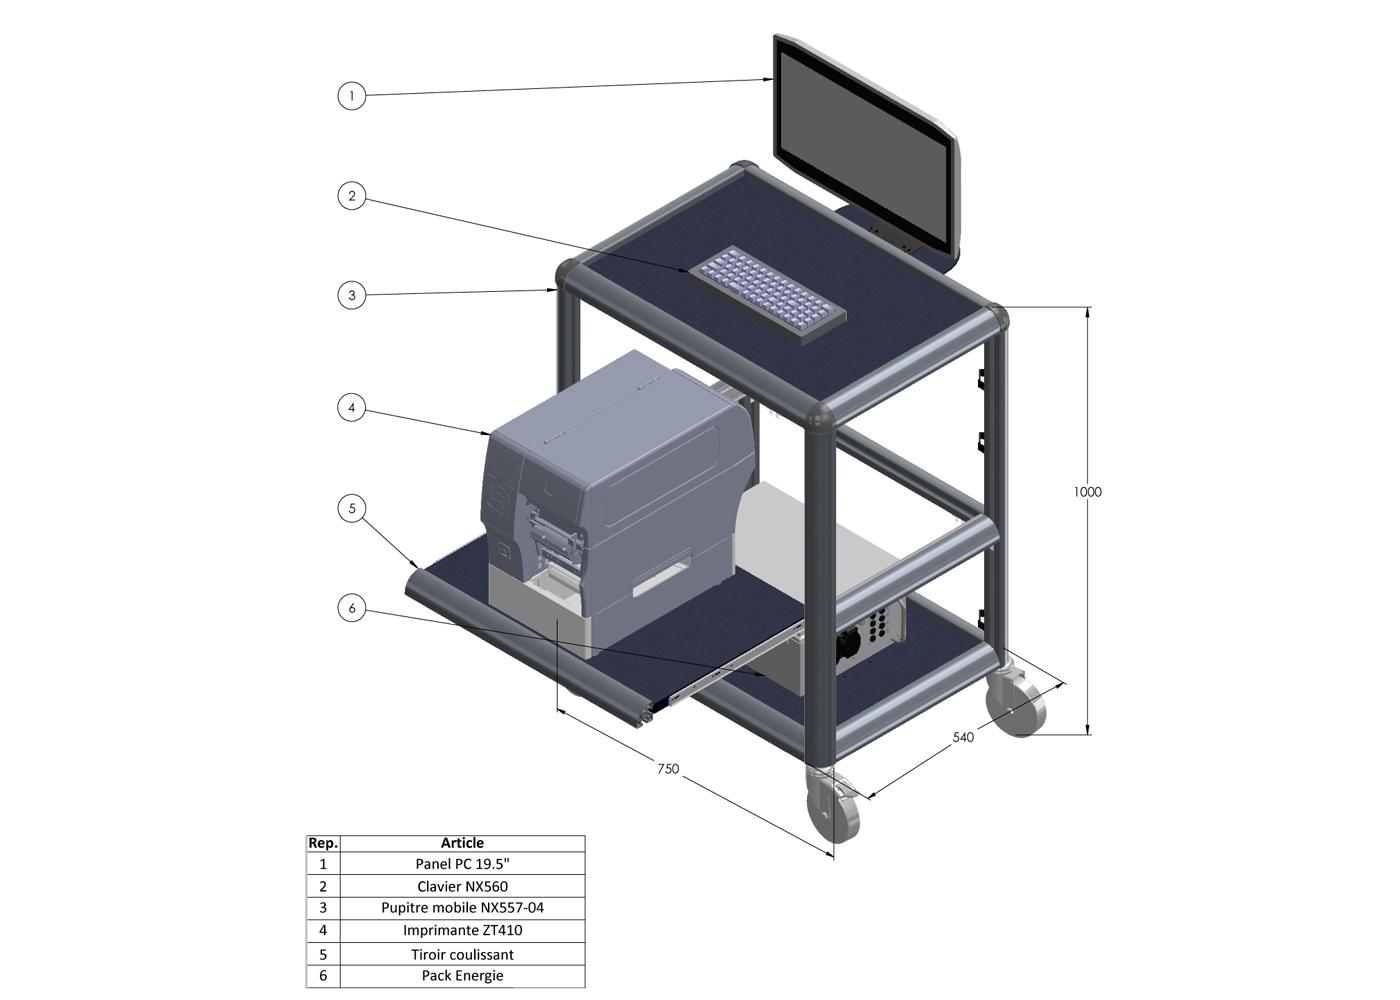 Chariot logistique NX557-04 – Chariot 750 x 540 x 1000 mm – Exemple d'équipement